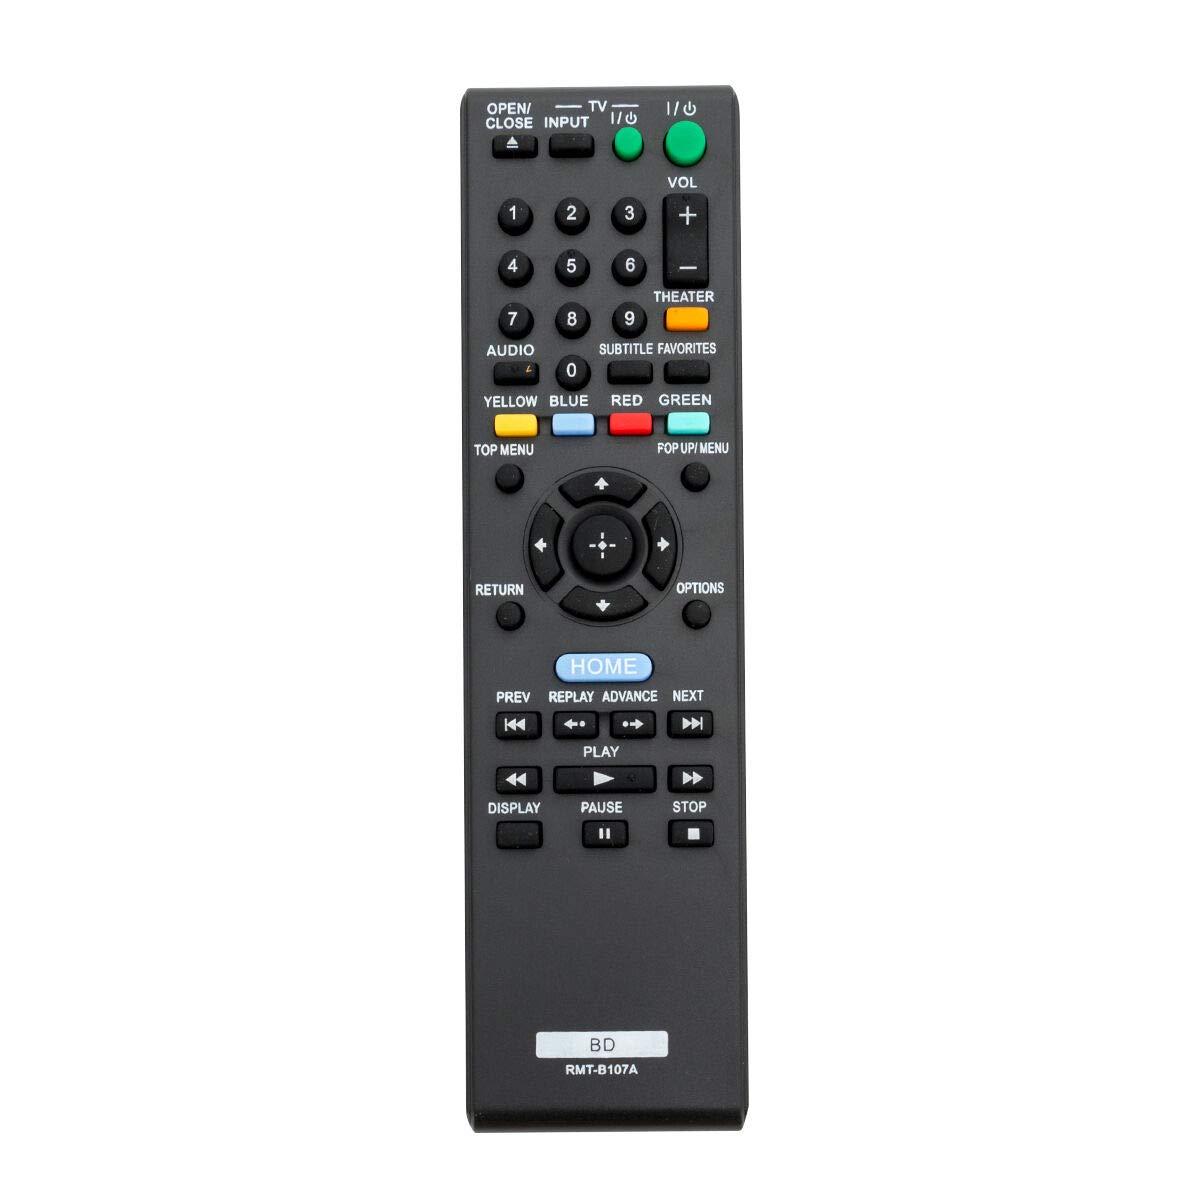 New Remote RMT-B107A Control for Sony BDP-BX37 BDP-S370 BDP-S373 45CS BDP-BX57